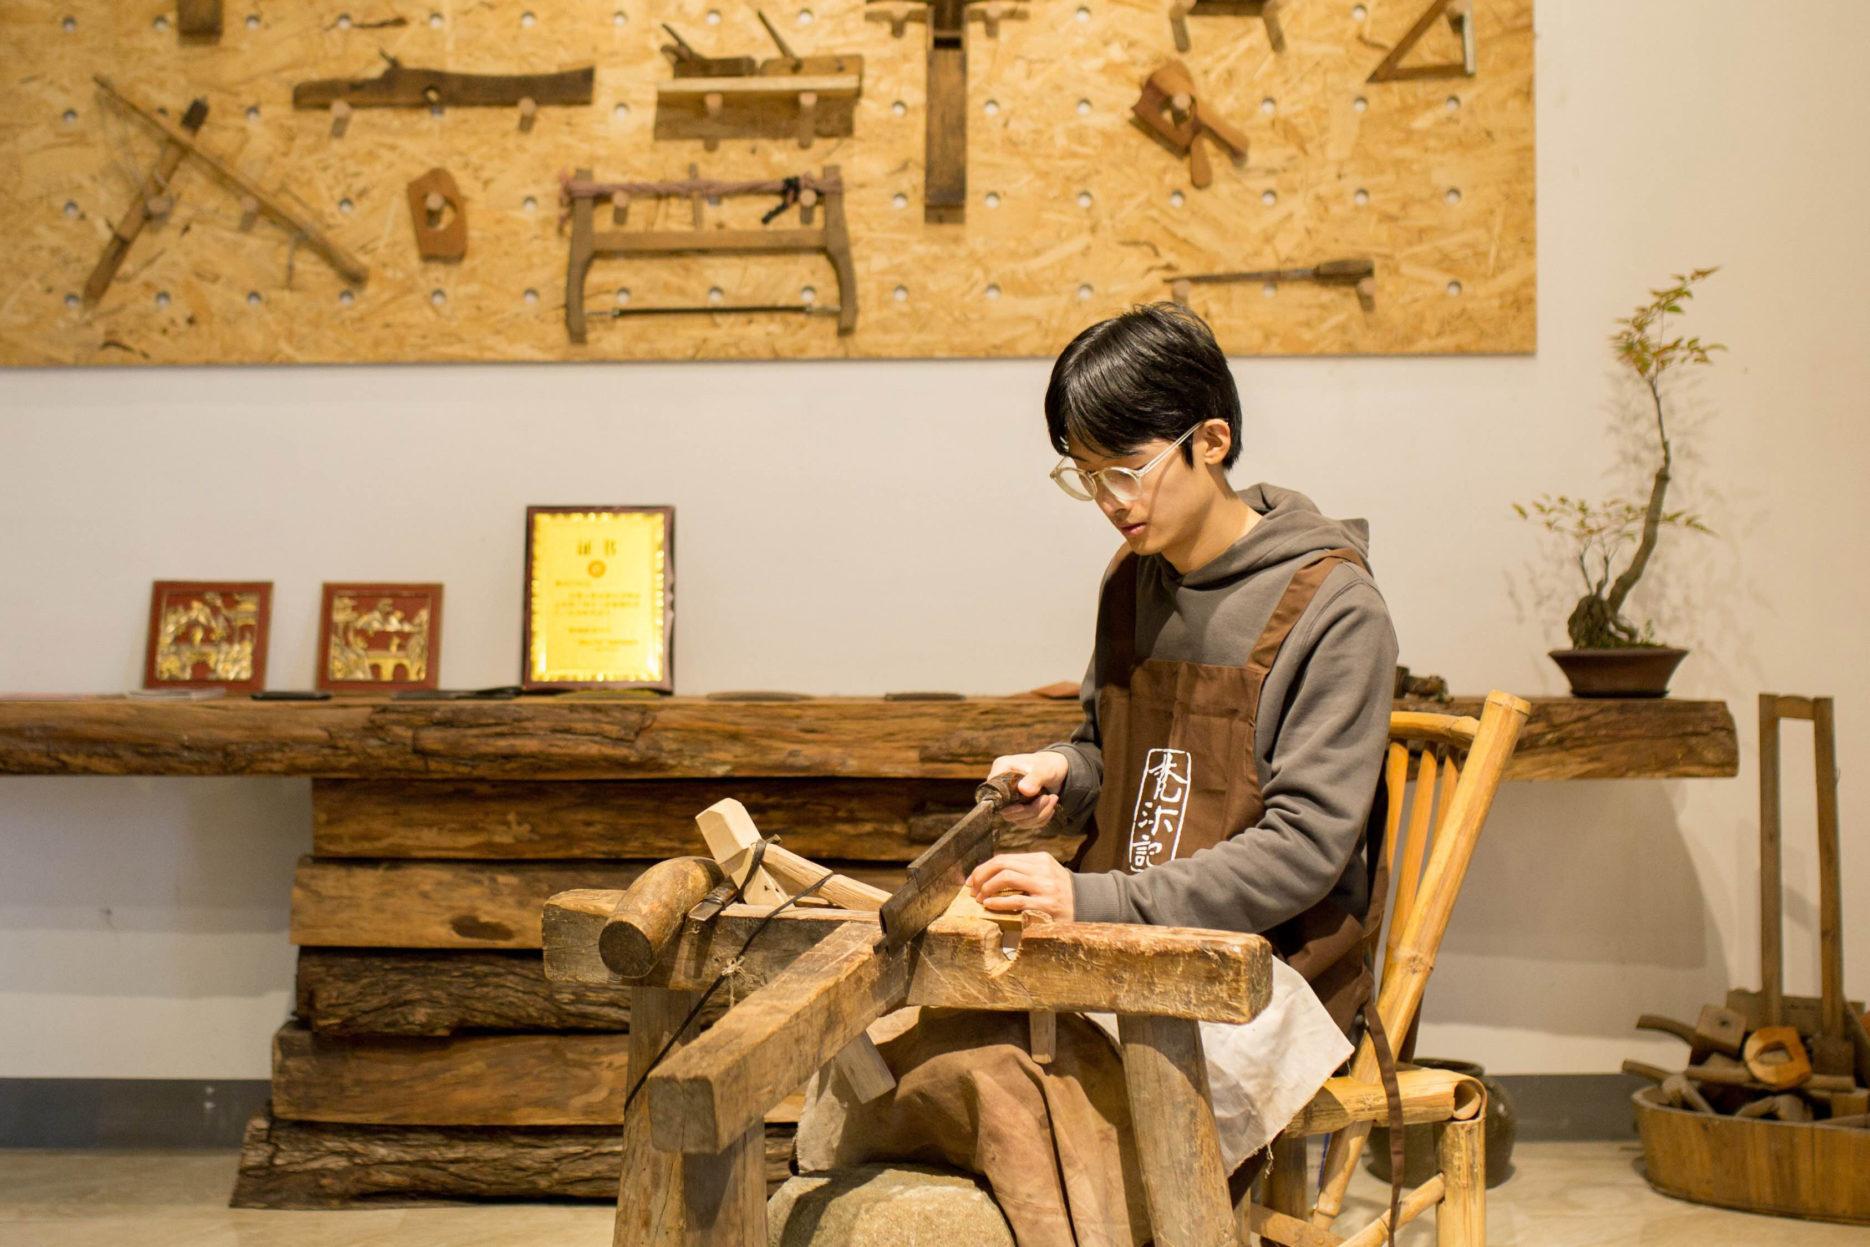 Cultural heritage consumption. Credit: 环球时报公益基金